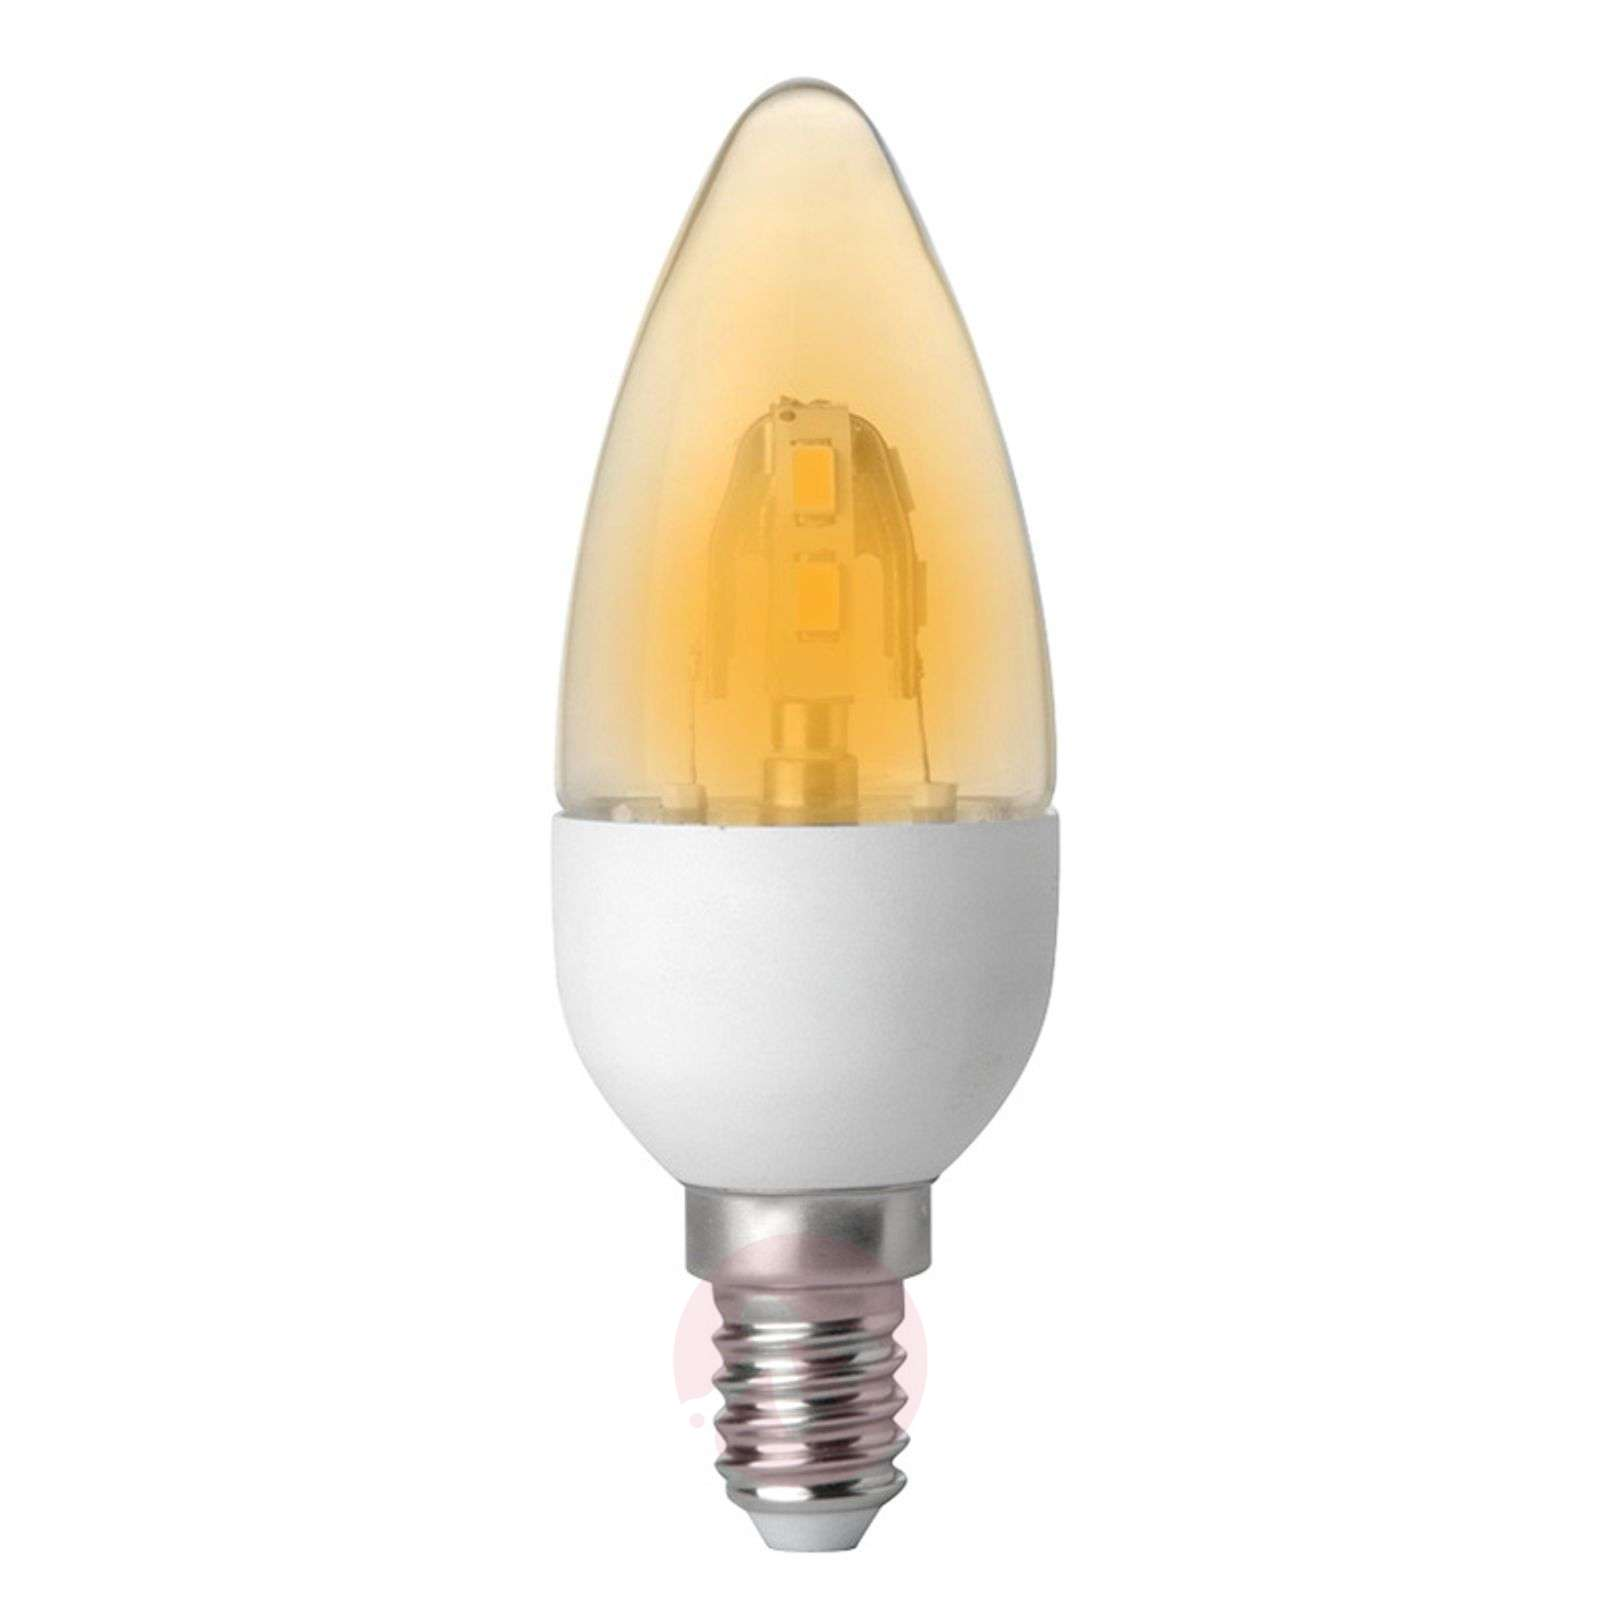 E14 3.5W 824 MEGAMAN LED candle bulb Mellotone-6530172-01